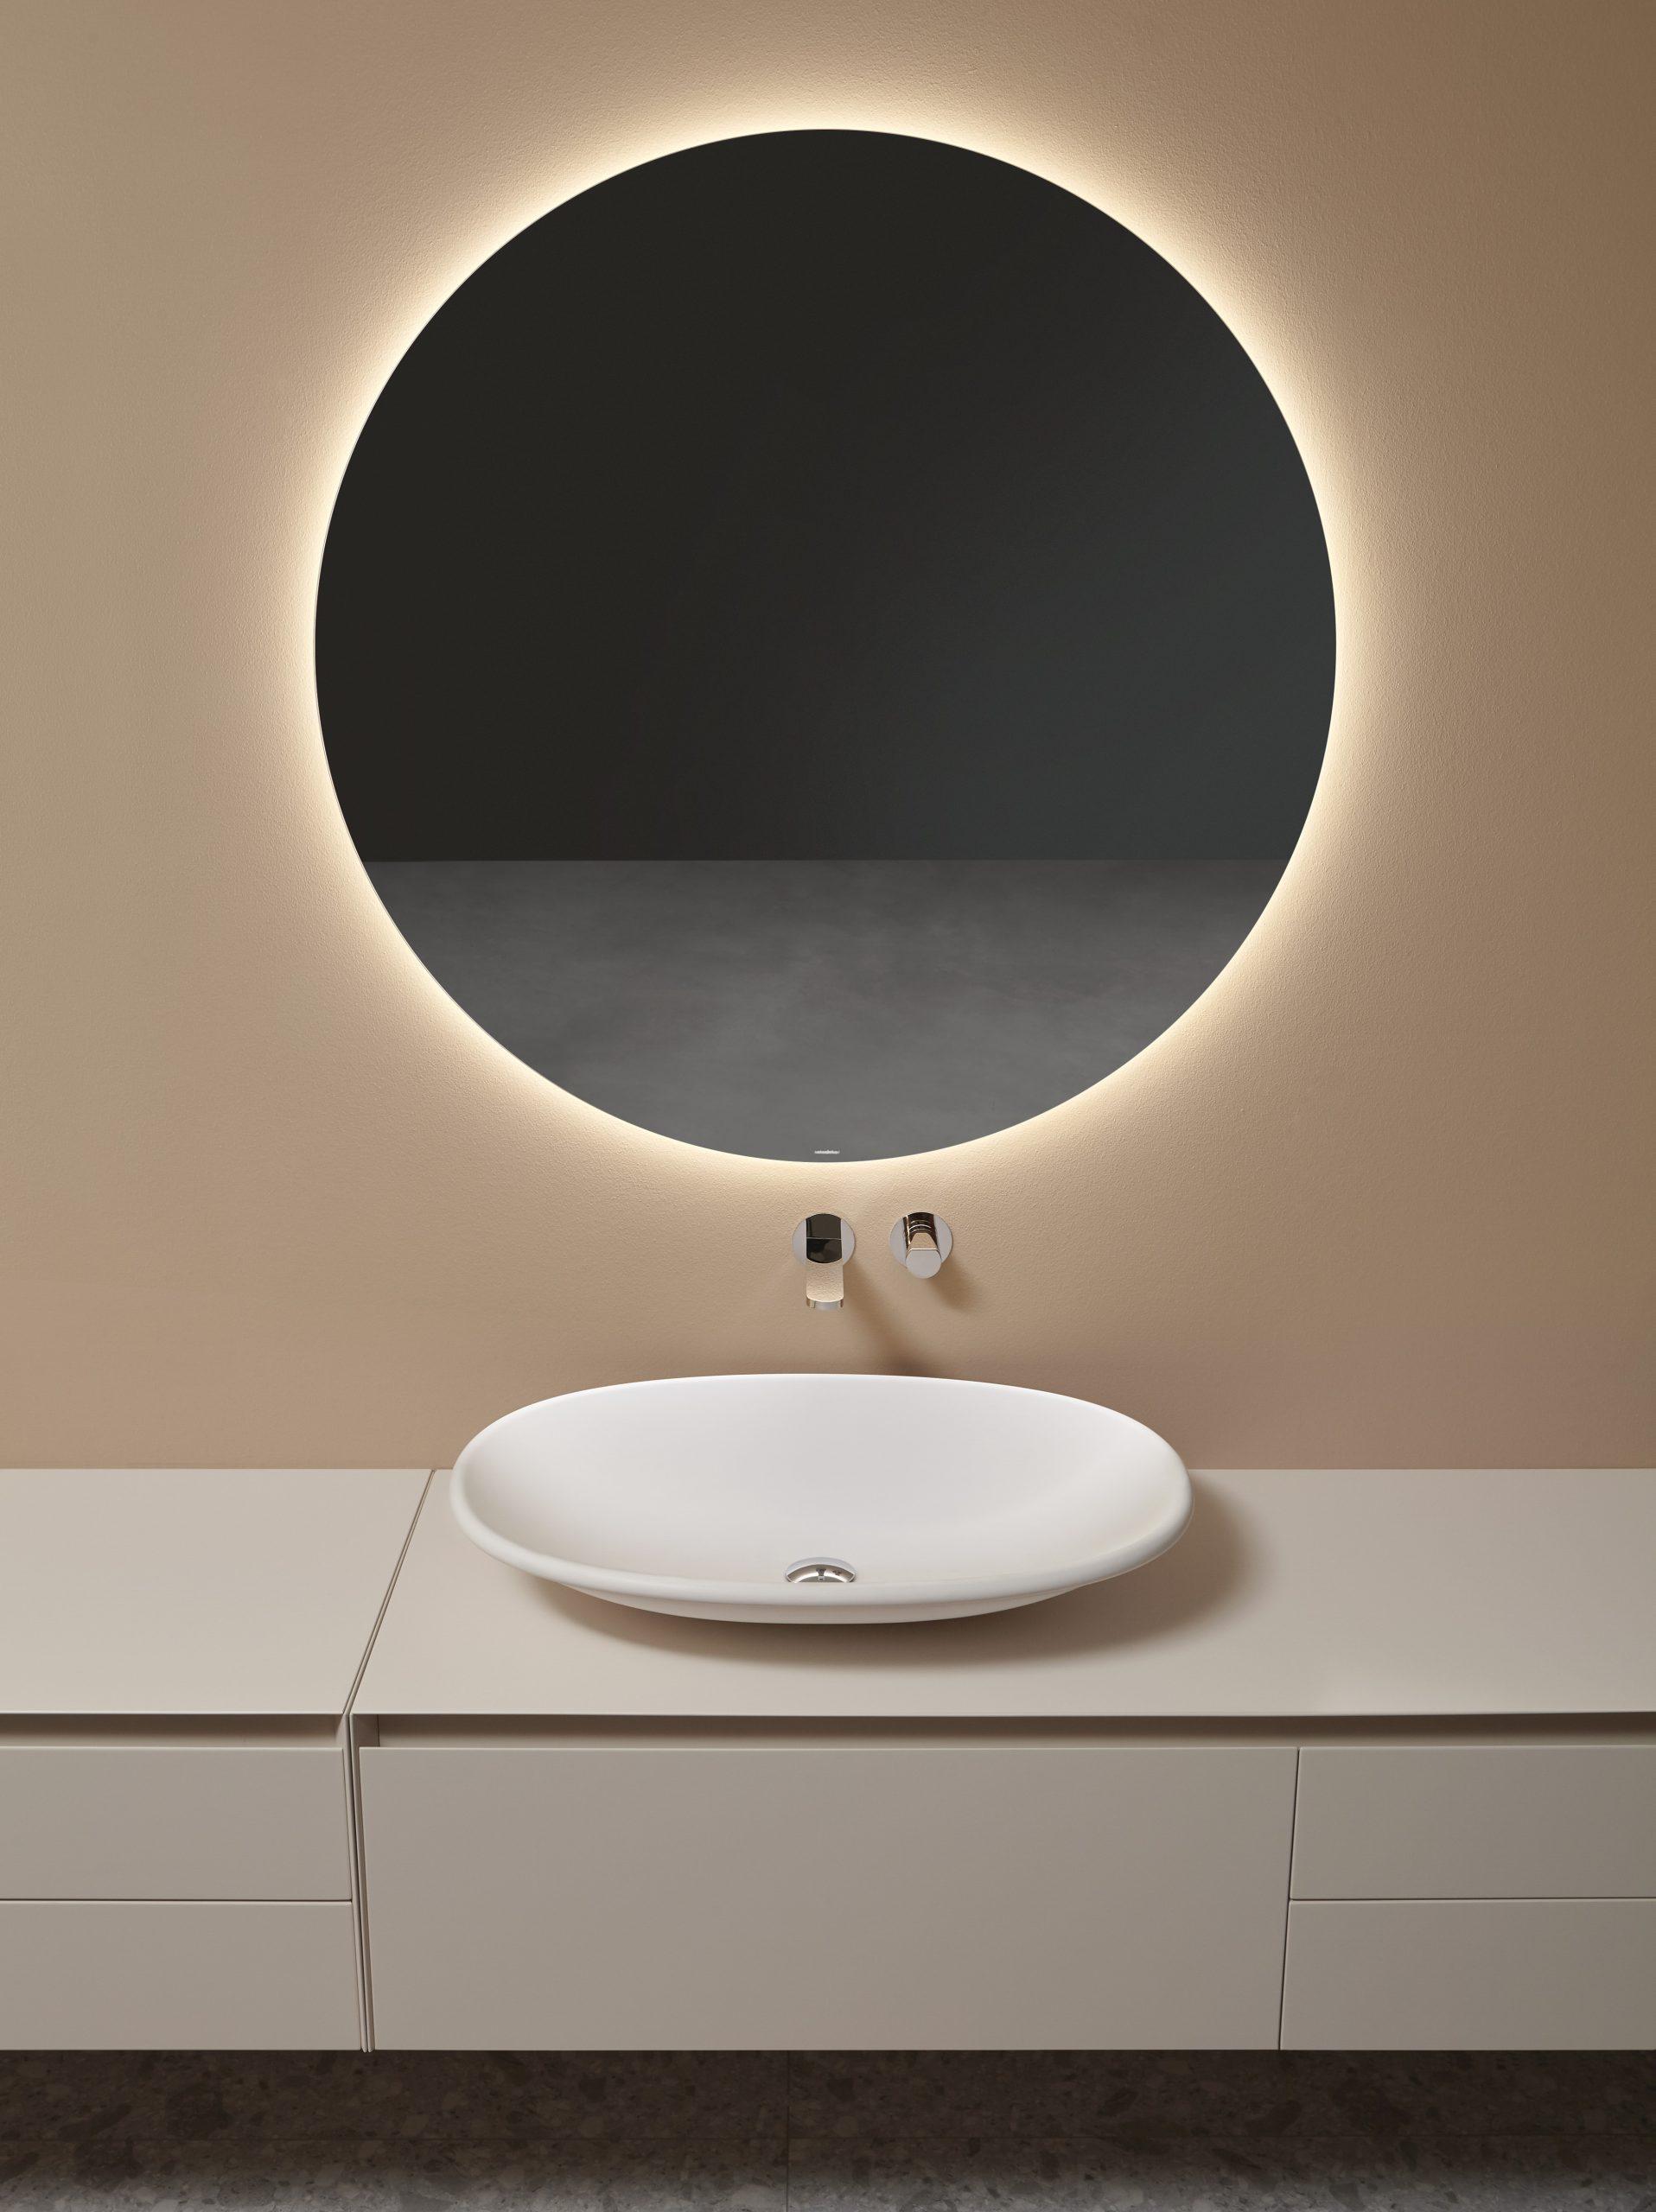 Oval Rim washbowl on PantaRei furniture